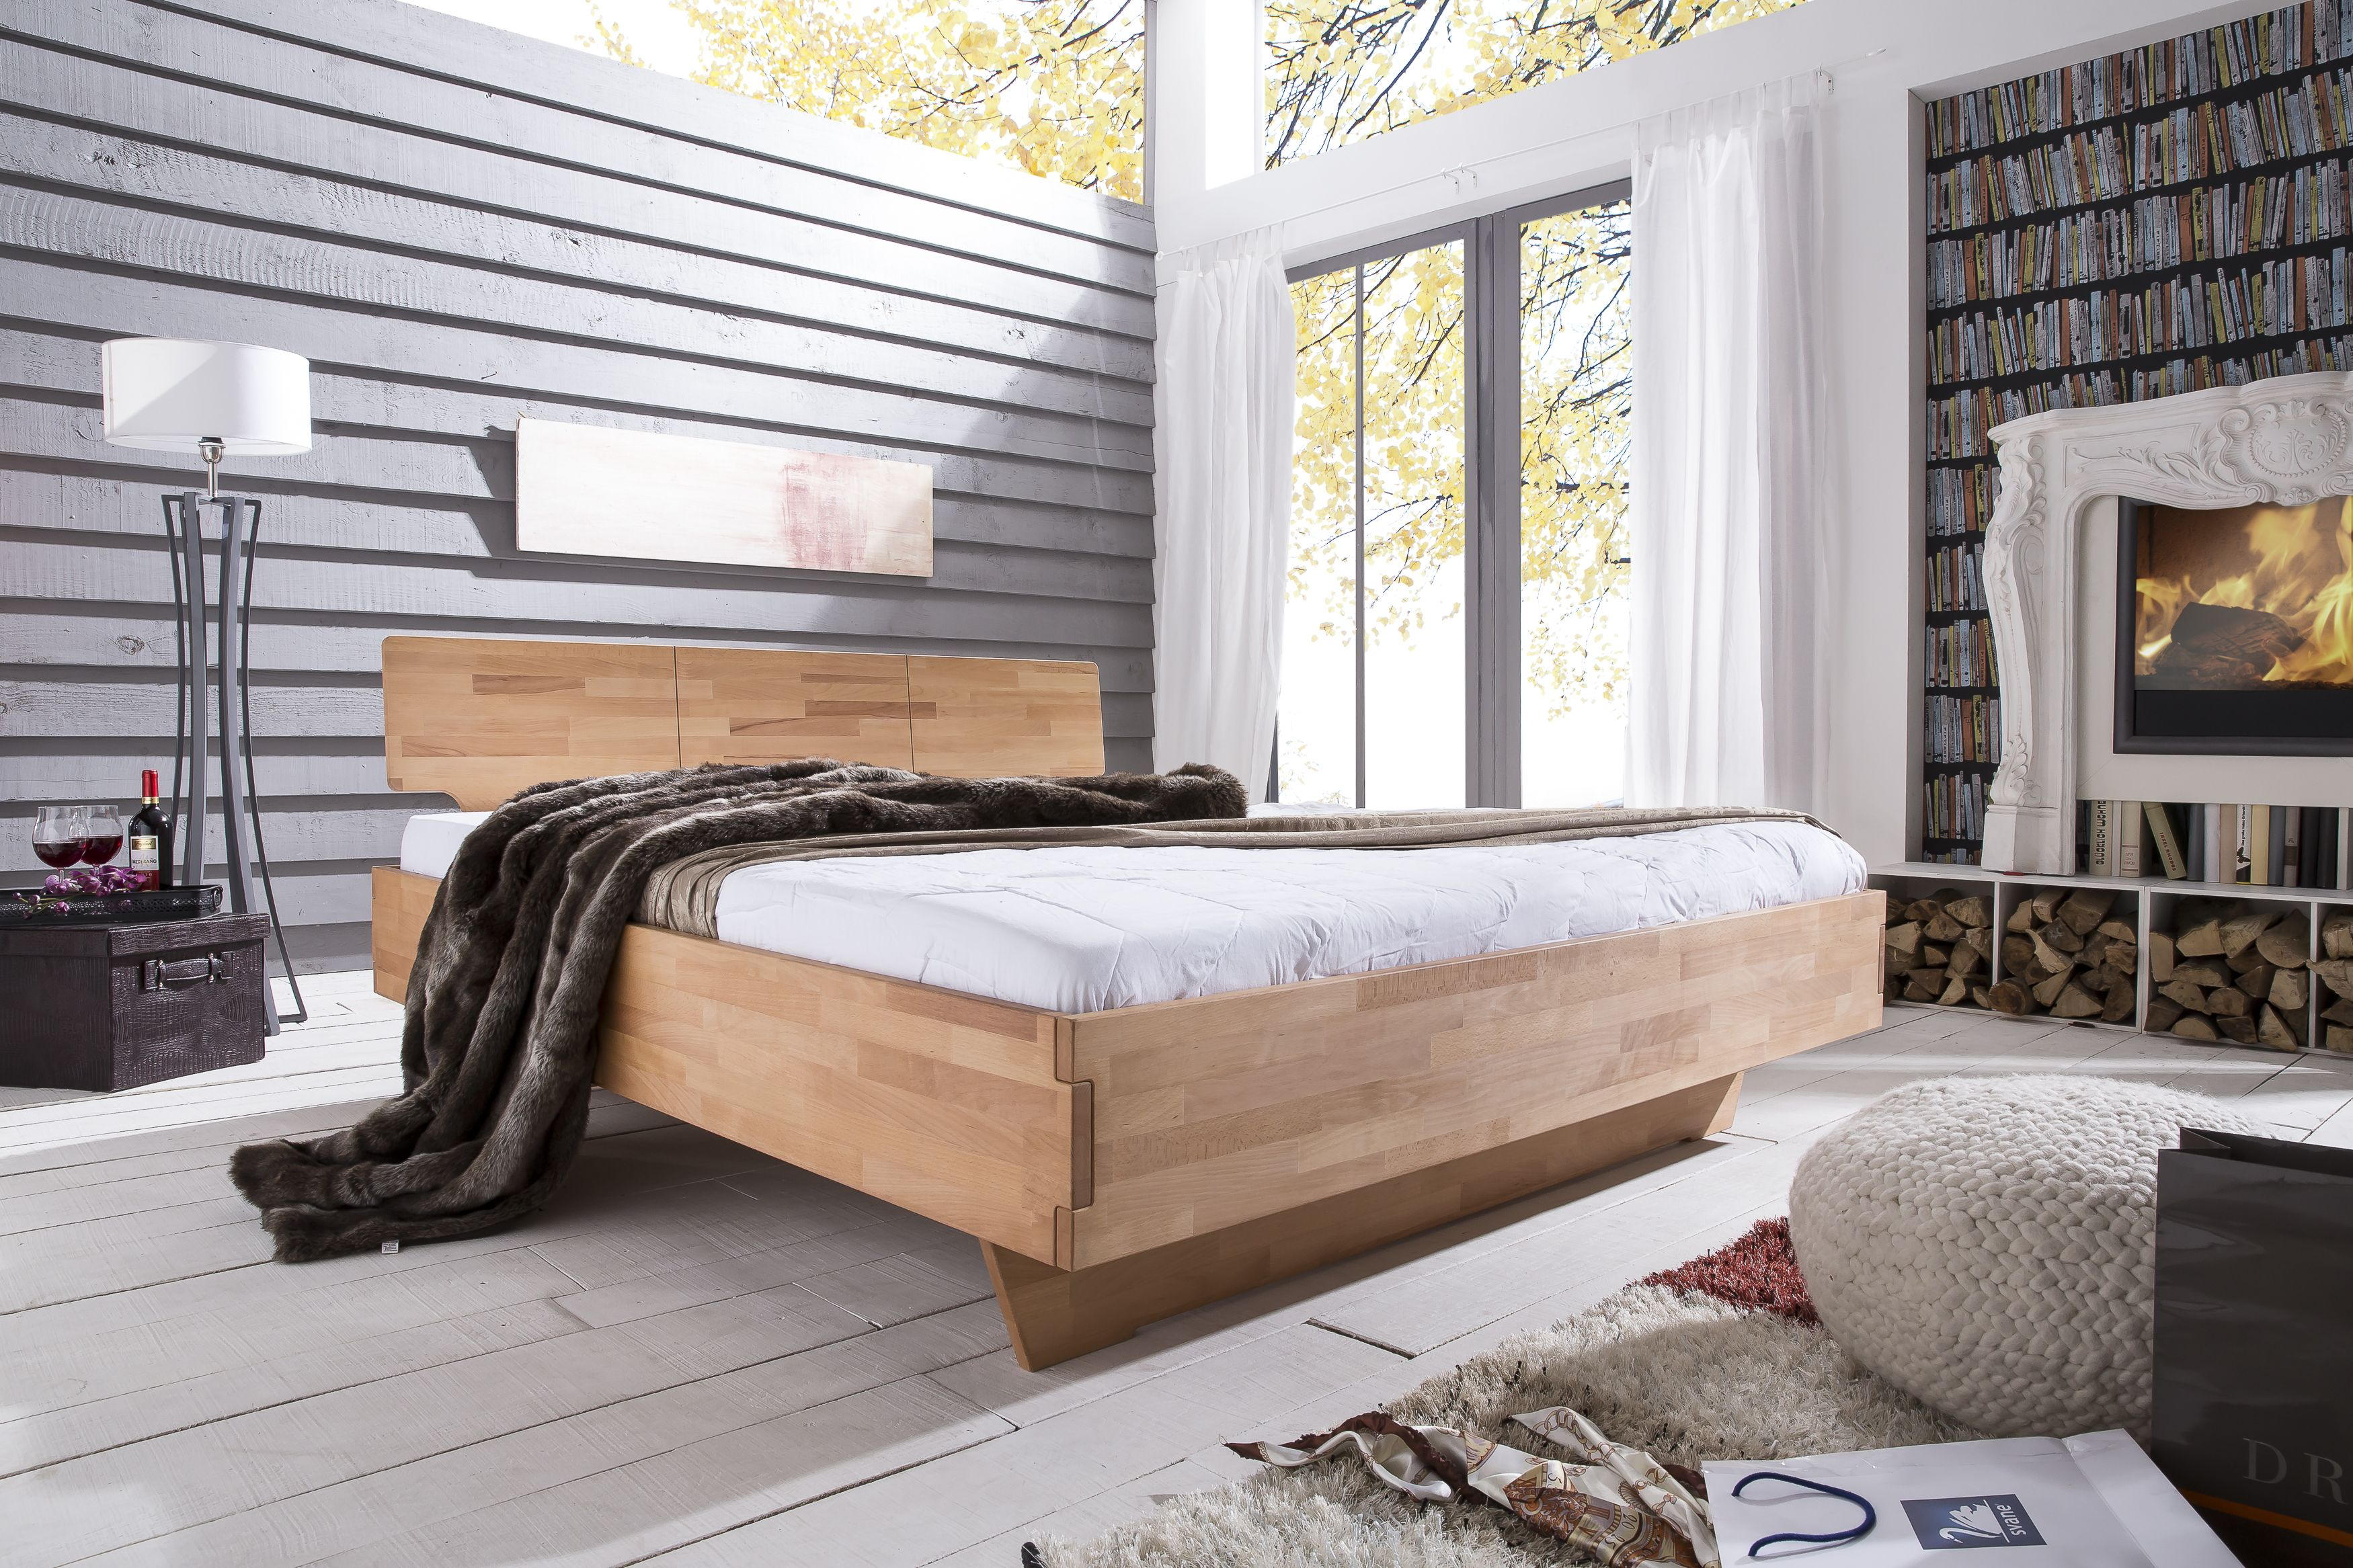 Massive Schlafzimmermöbel #Schlafzimmer #Bett #Massivholzbett ...